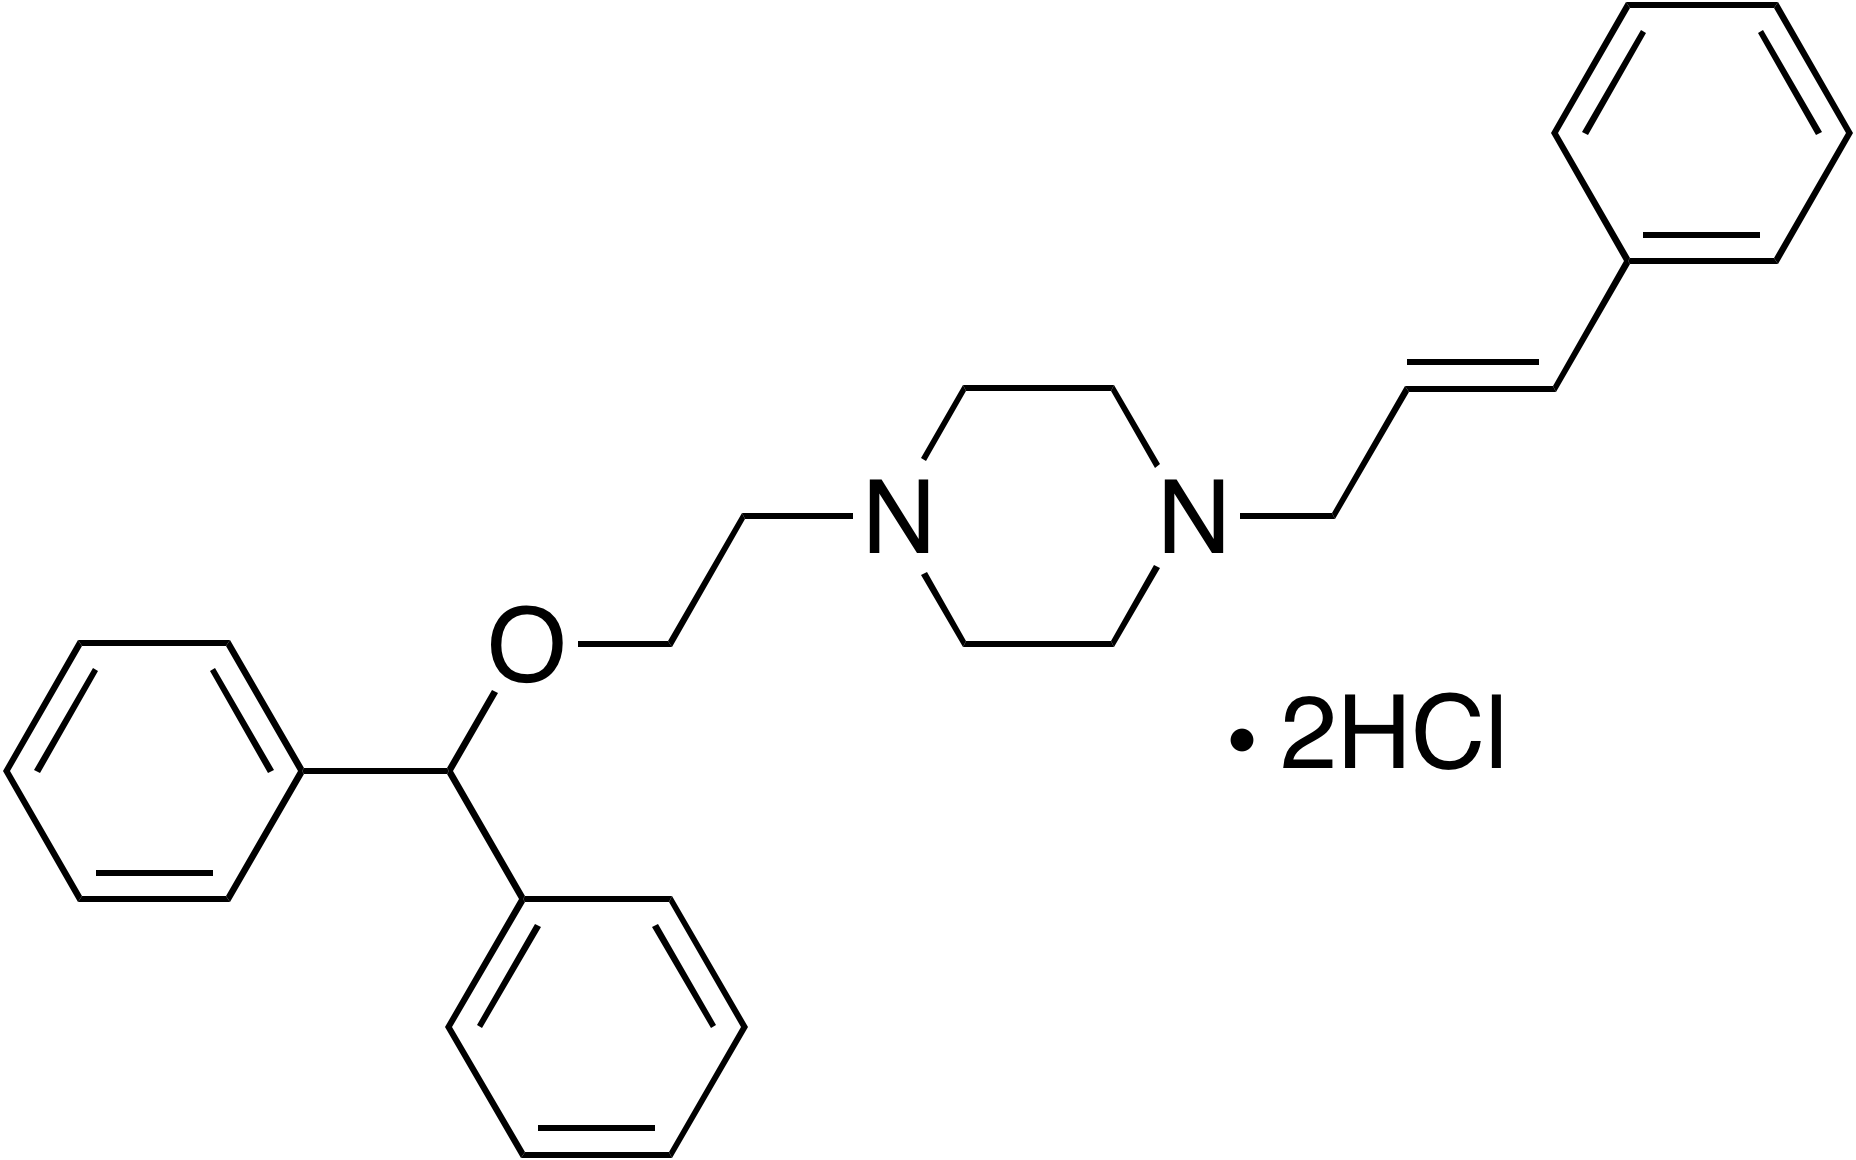 GBR12783 dihydrochloride